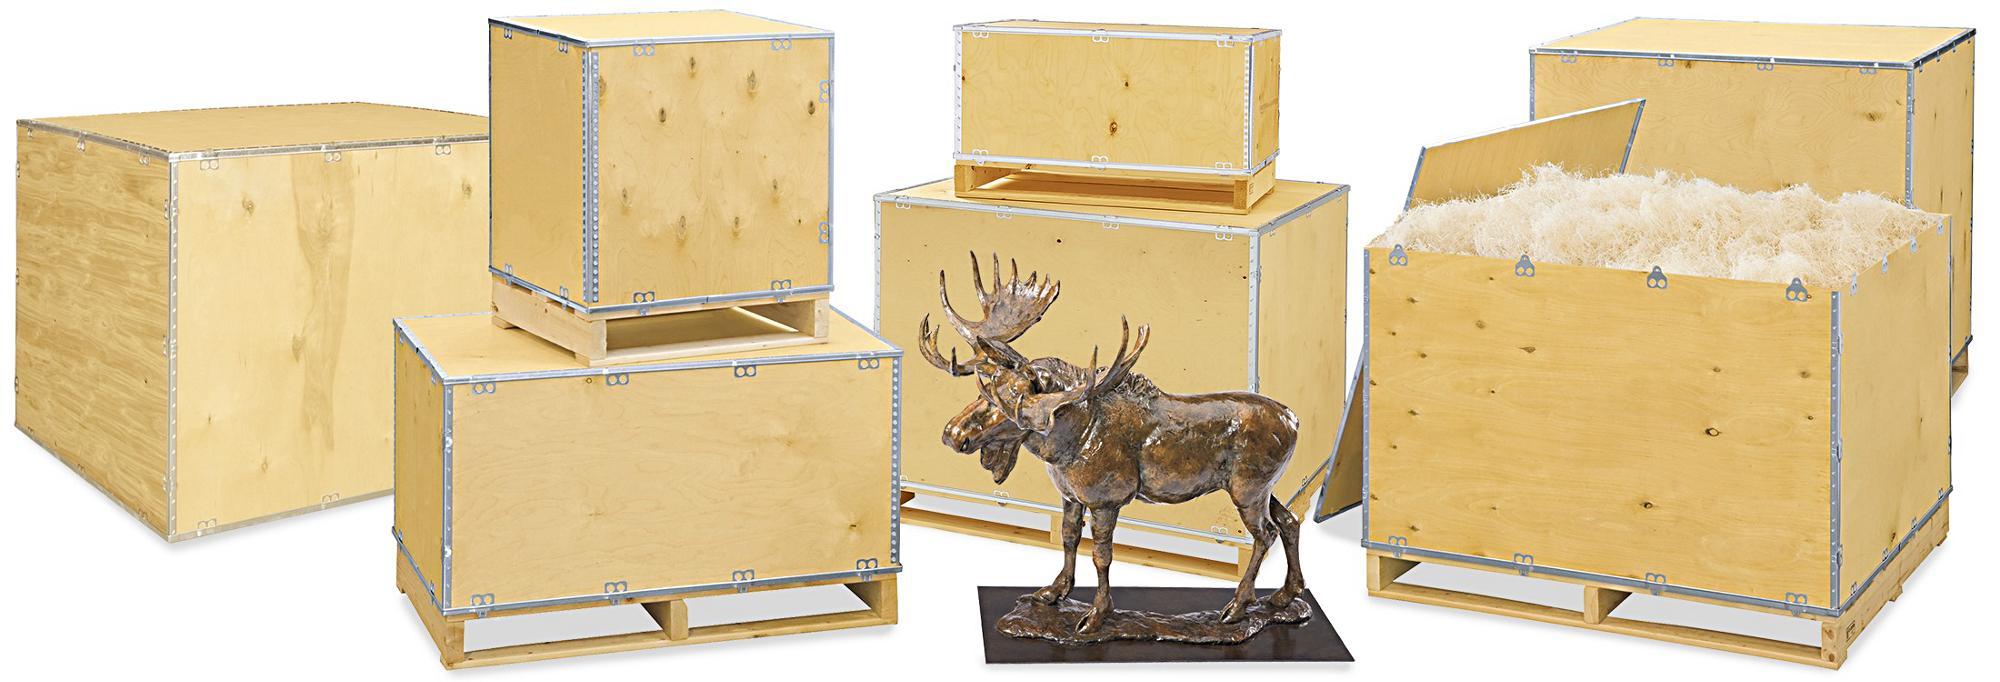 Standard Wood Crates